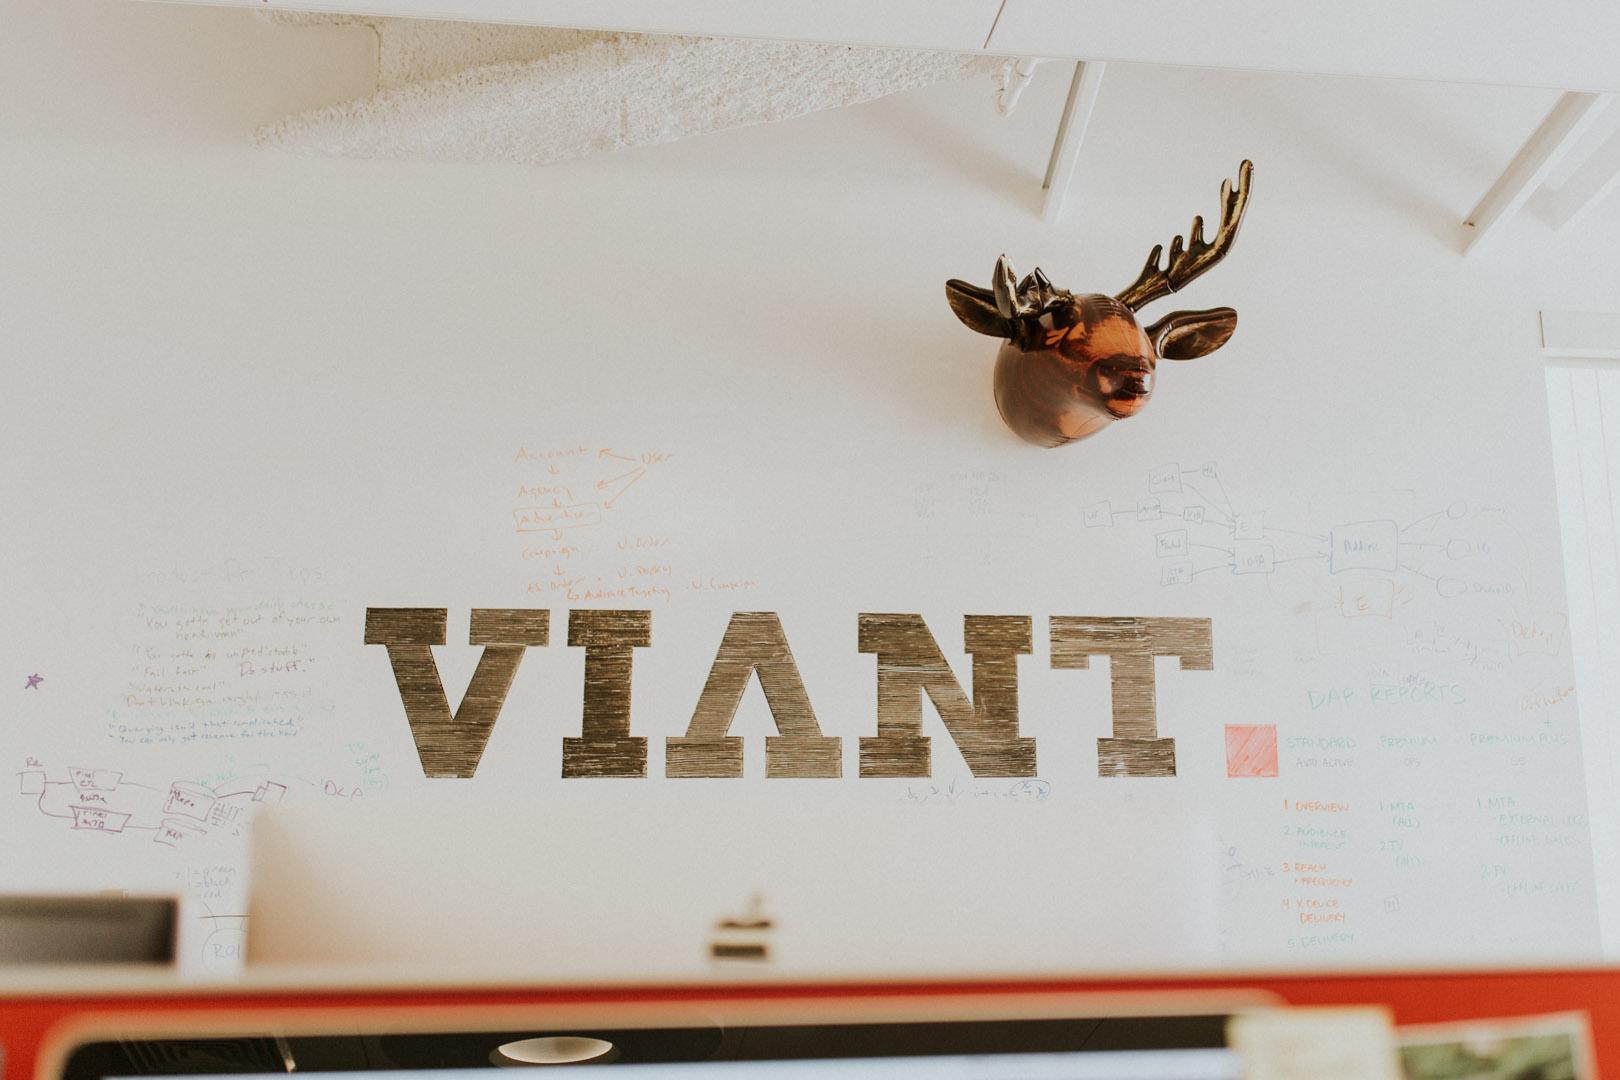 Viant-001.jpg